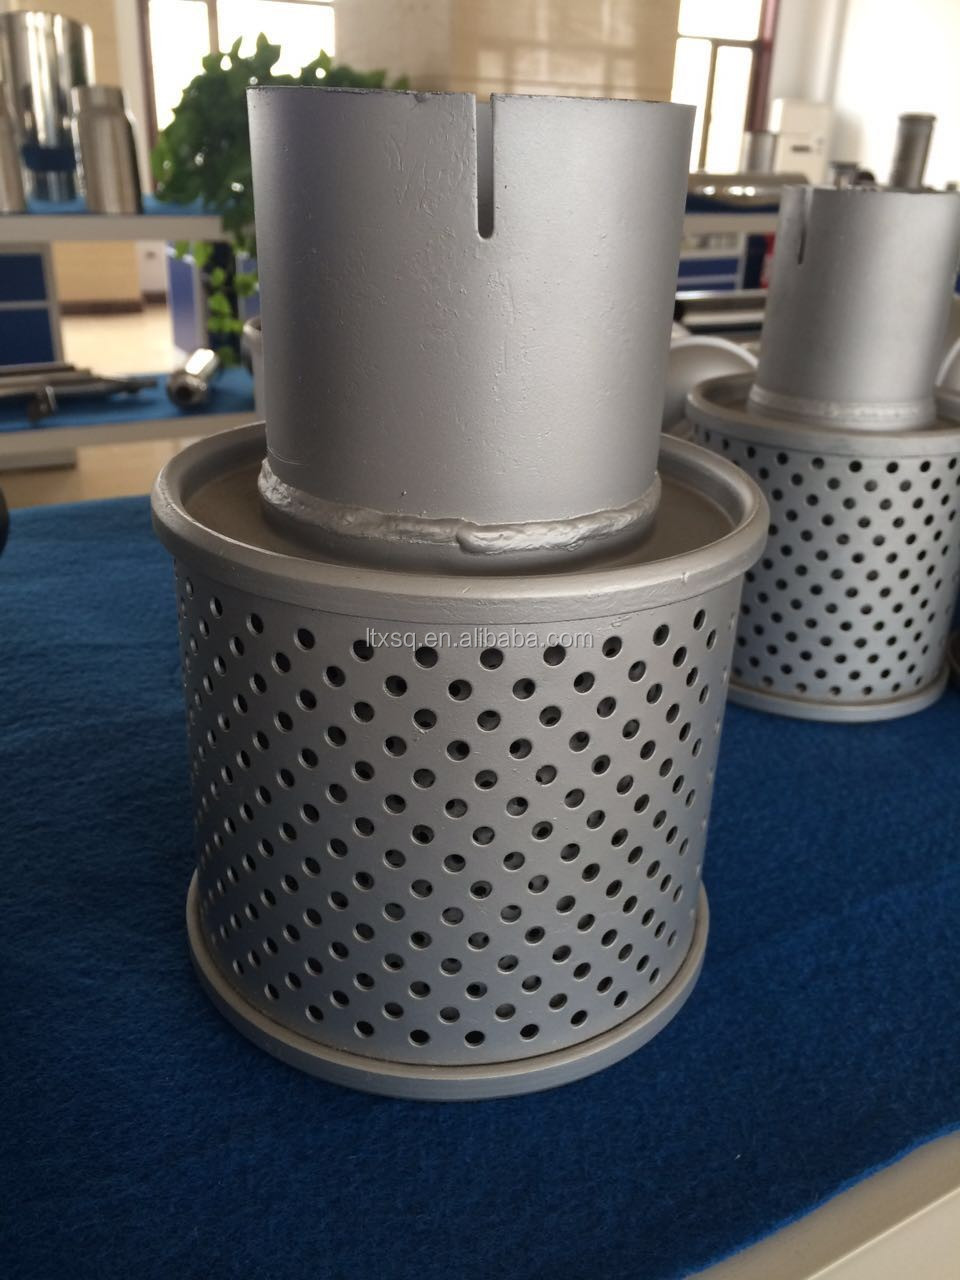 Spark Arrestor Gas : High quality spark arrestor exhaust muffler low price